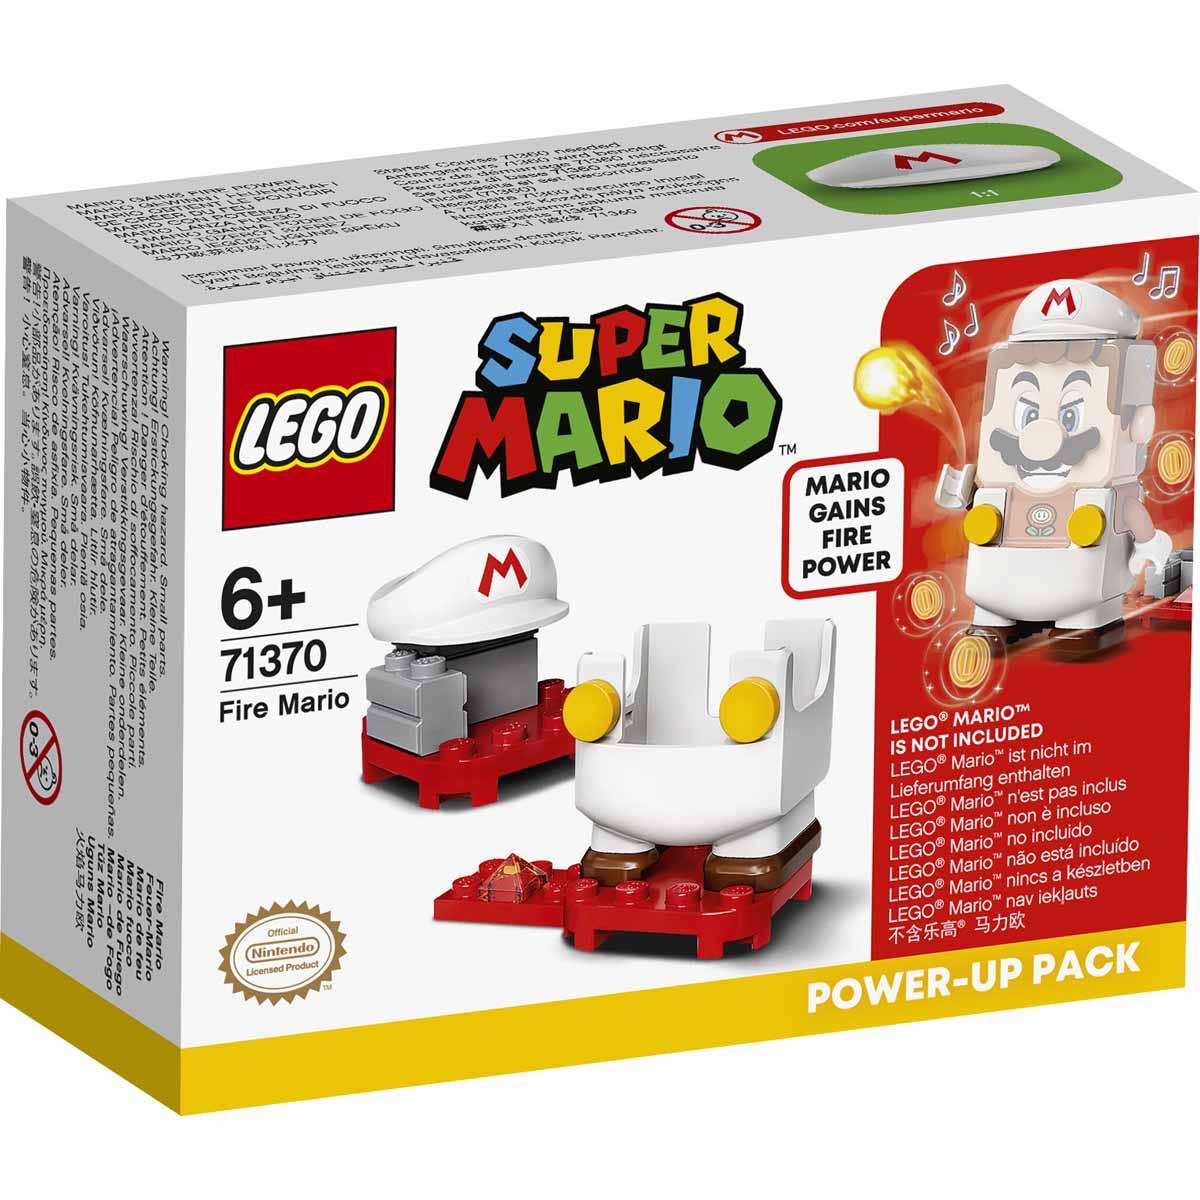 lego-super-mario-71370-fire-mario-boostpaket (1)